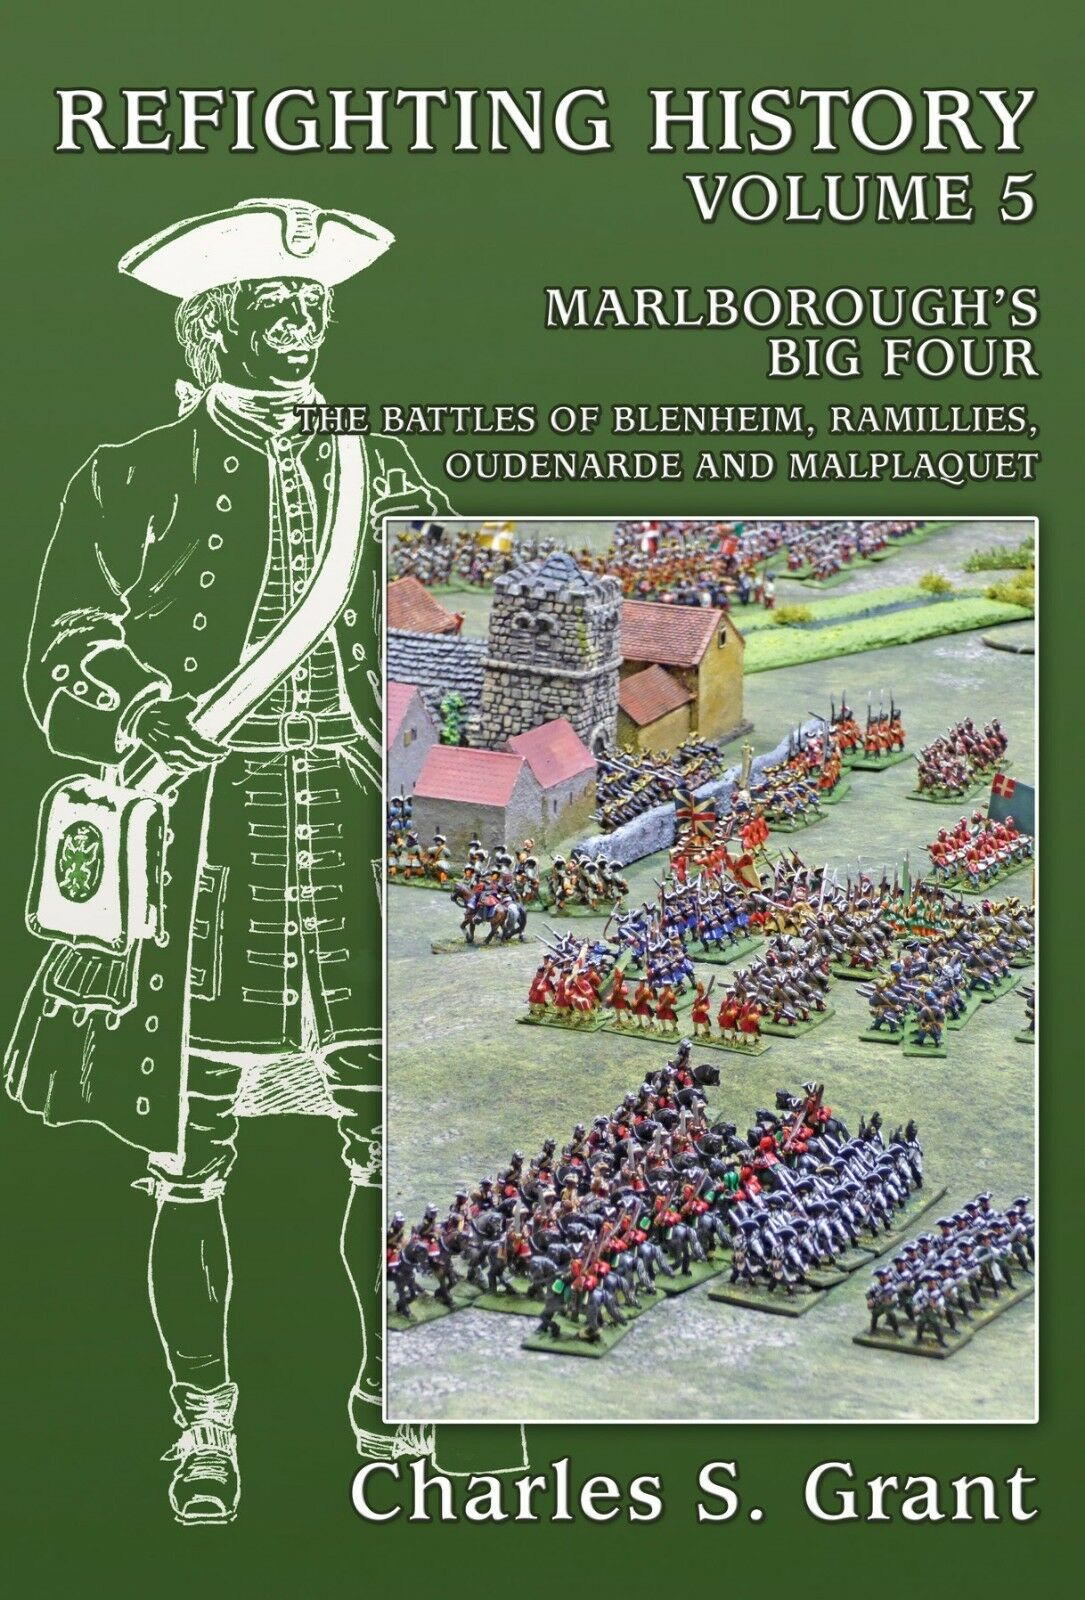 Refighting Storia -  Volume 5 MARLBoroUGH'S gree Quattro - Partizan Press  negozio online outlet